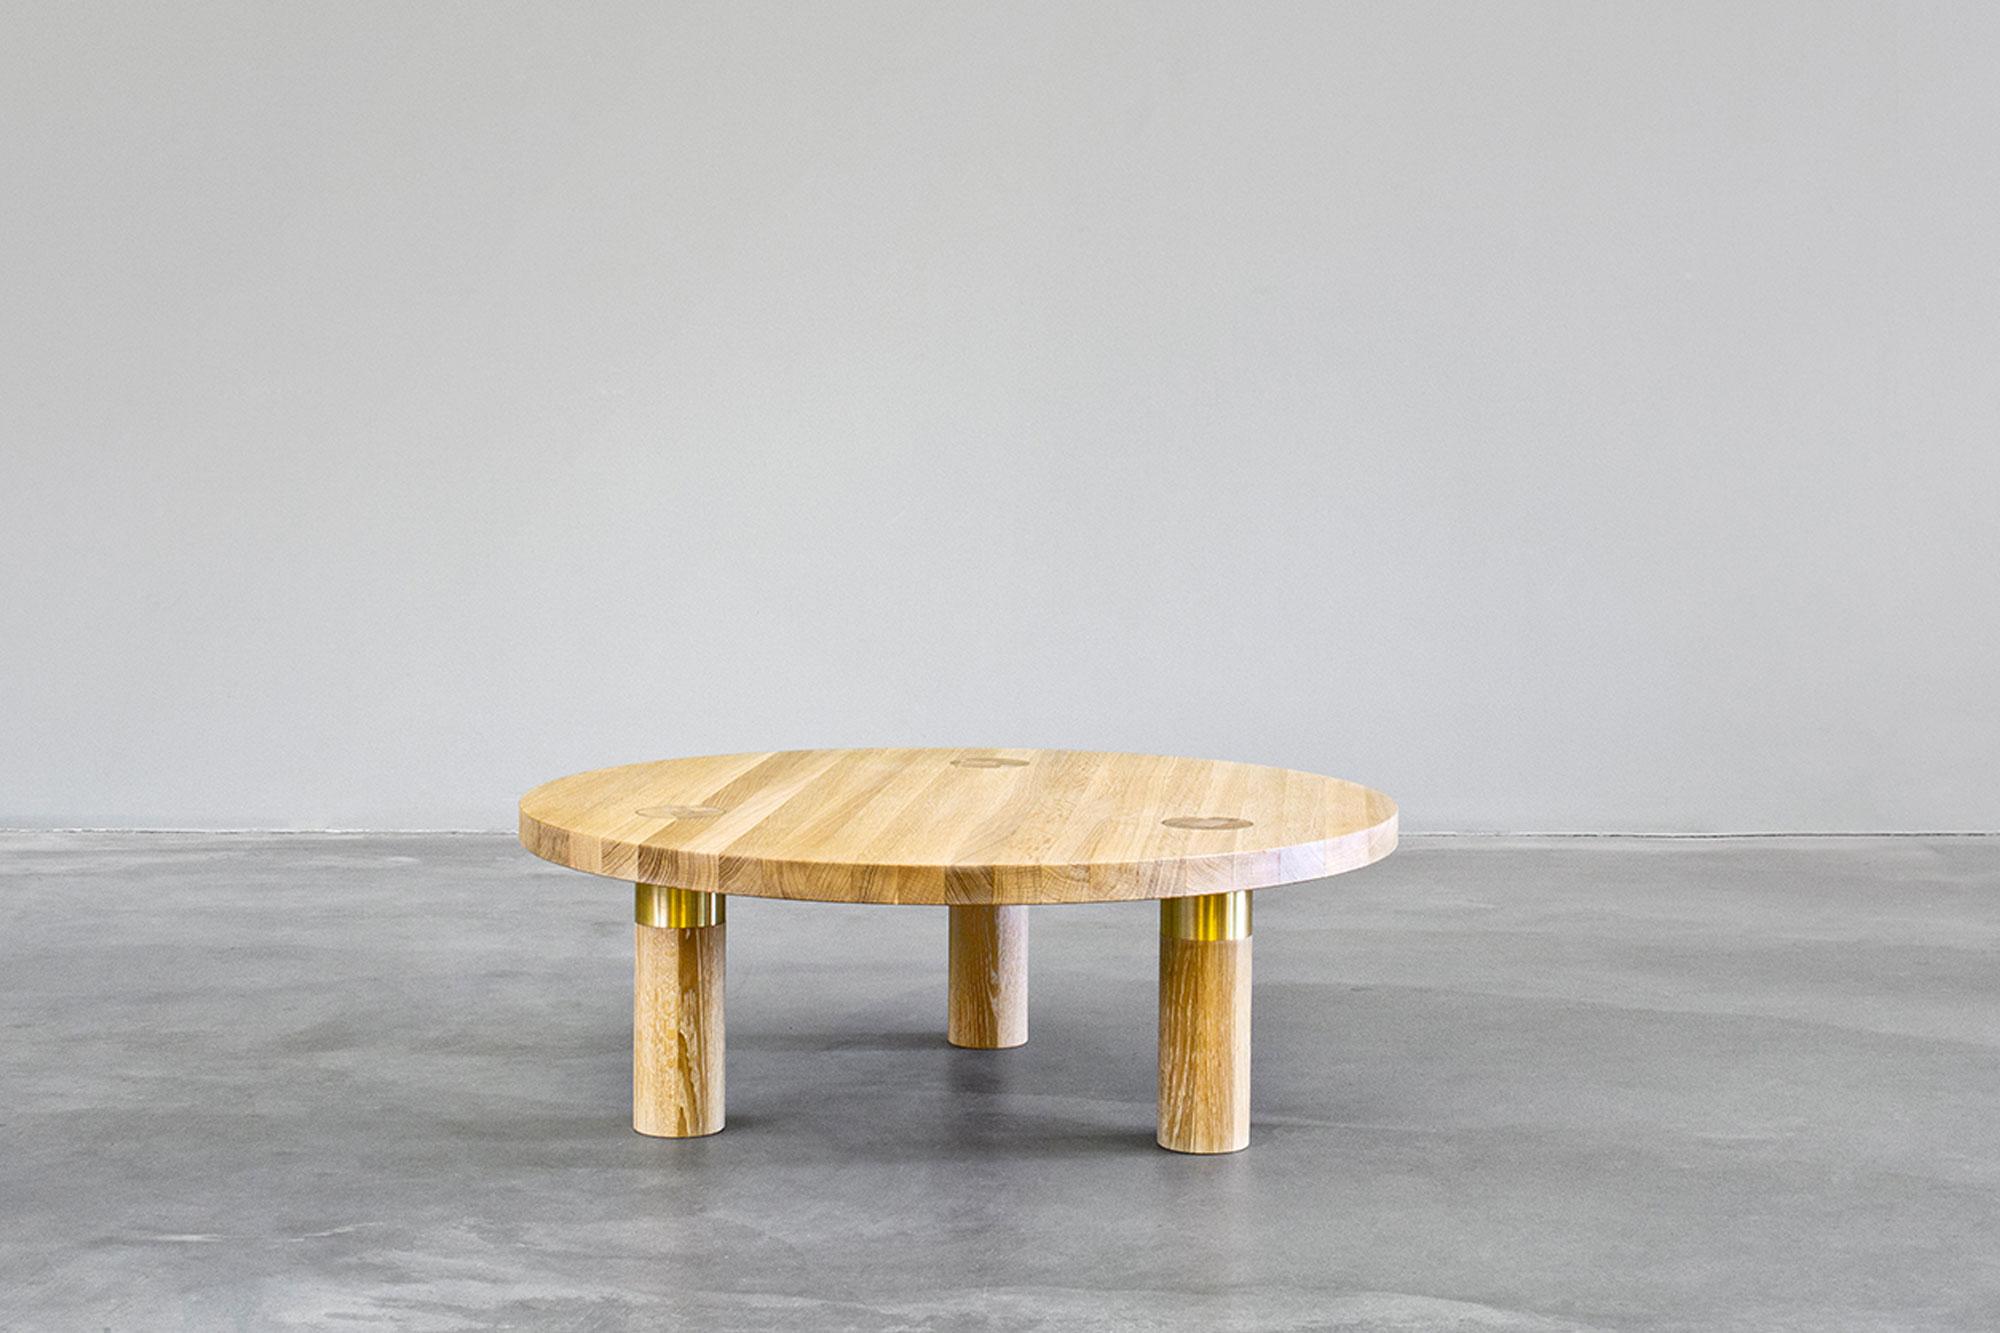 morgen-kollektion-pole-table-3